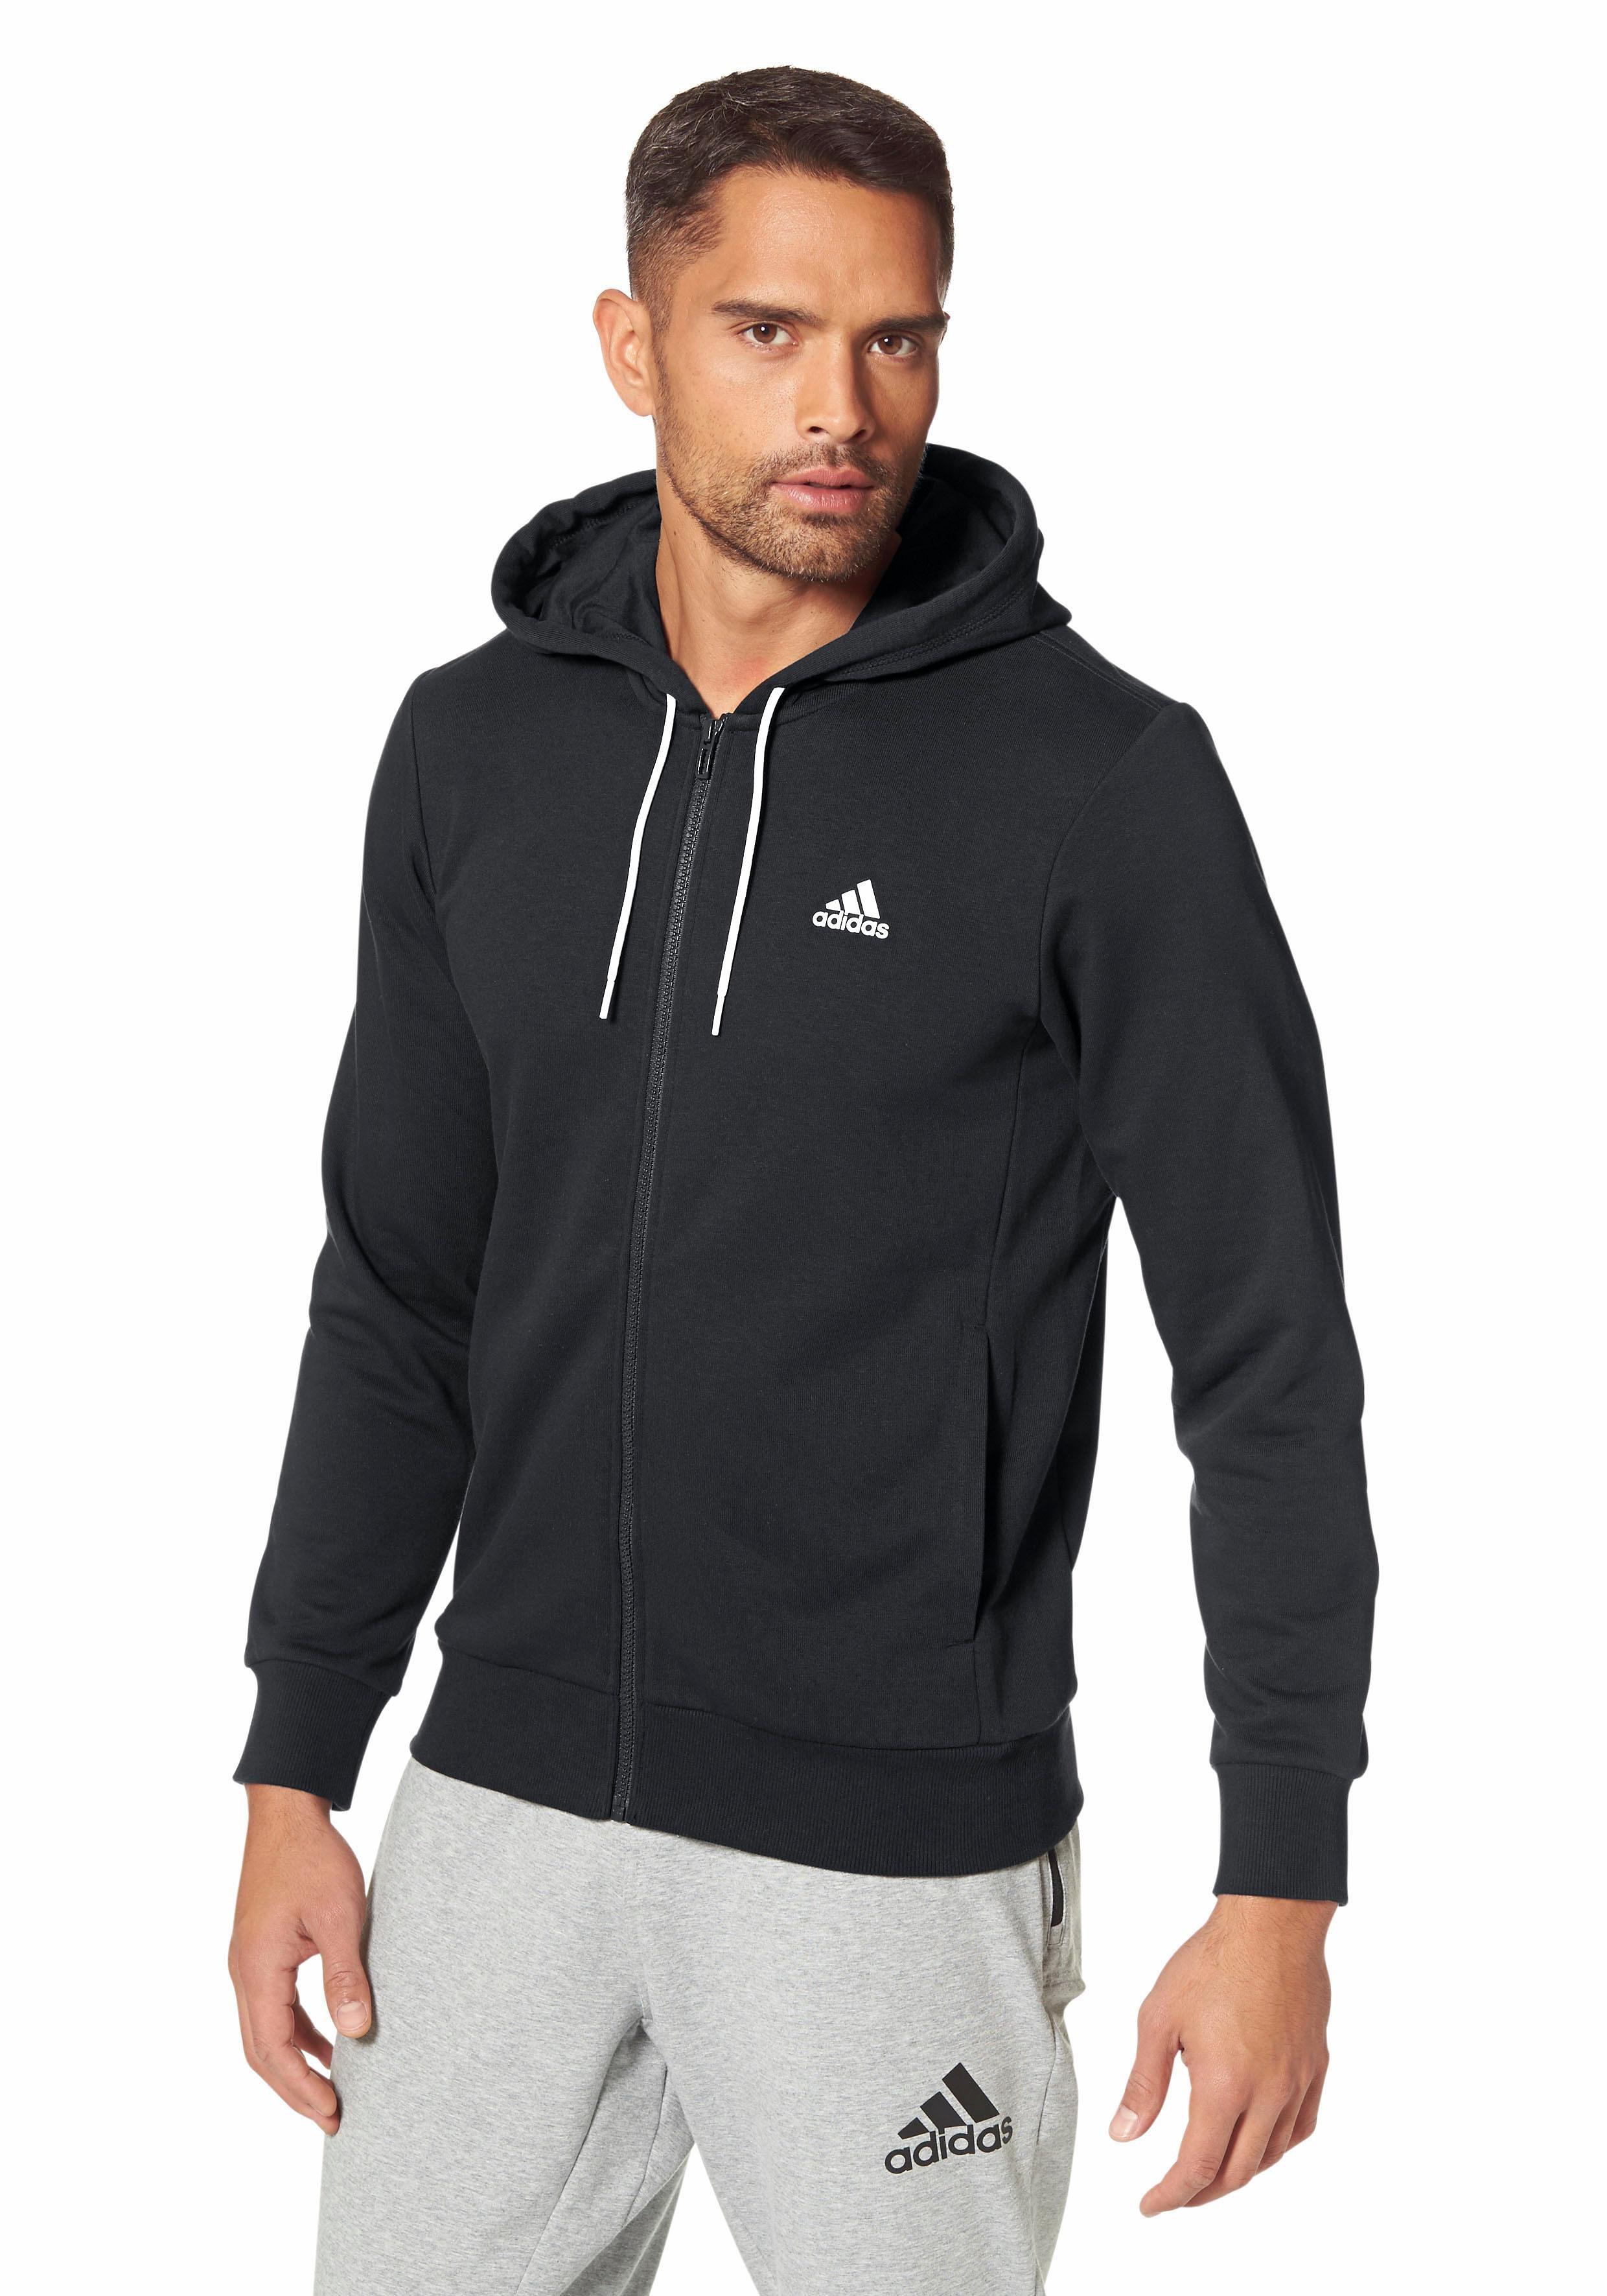 Adidas Performance Funktions-kapuzensweatjacke »woven« Black